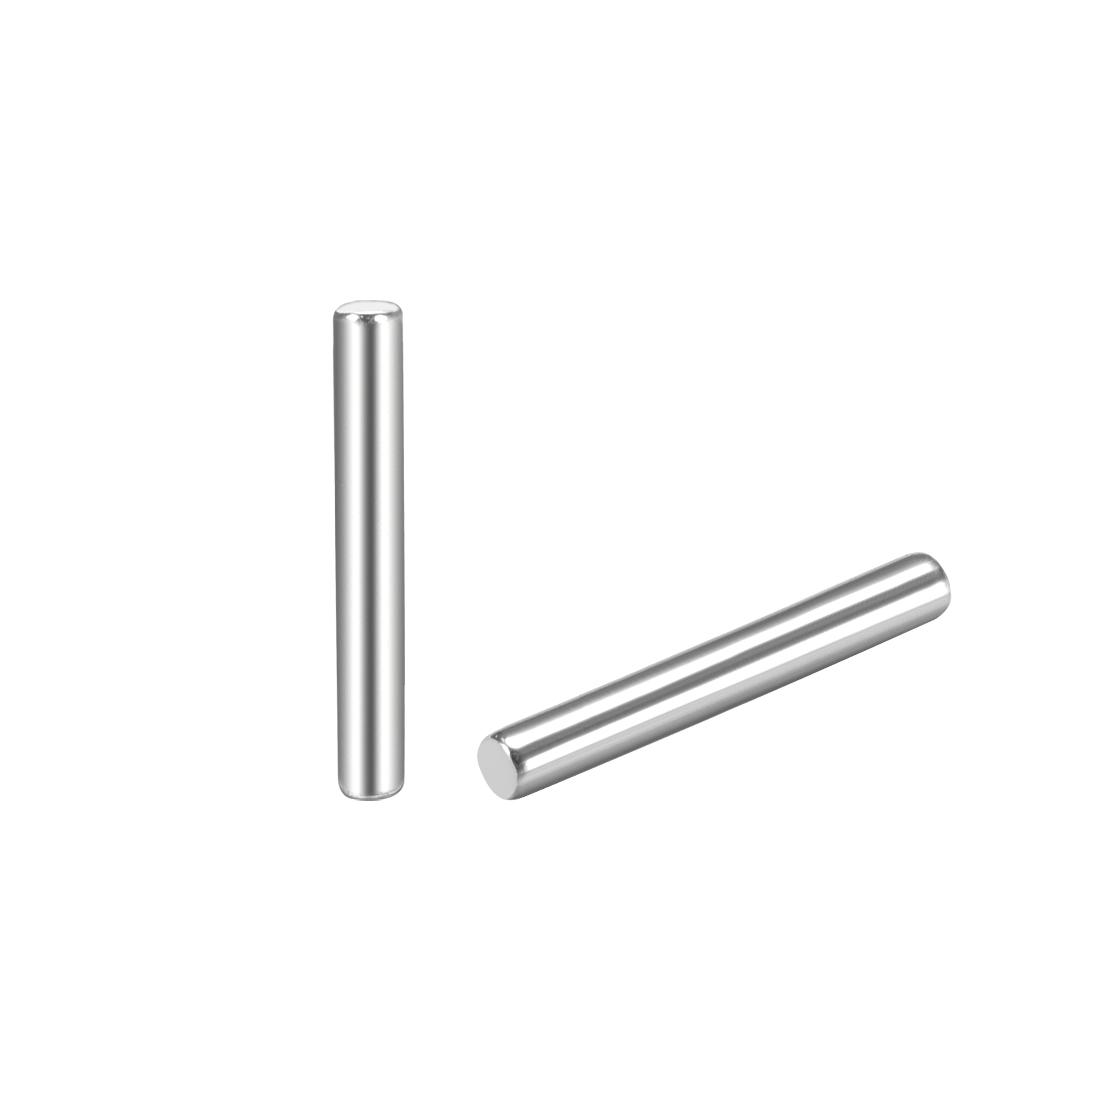 25Pcs 1.5mm x 12mm Dowel Pin 304 Stainless Steel Shelf Support Pin Fasten